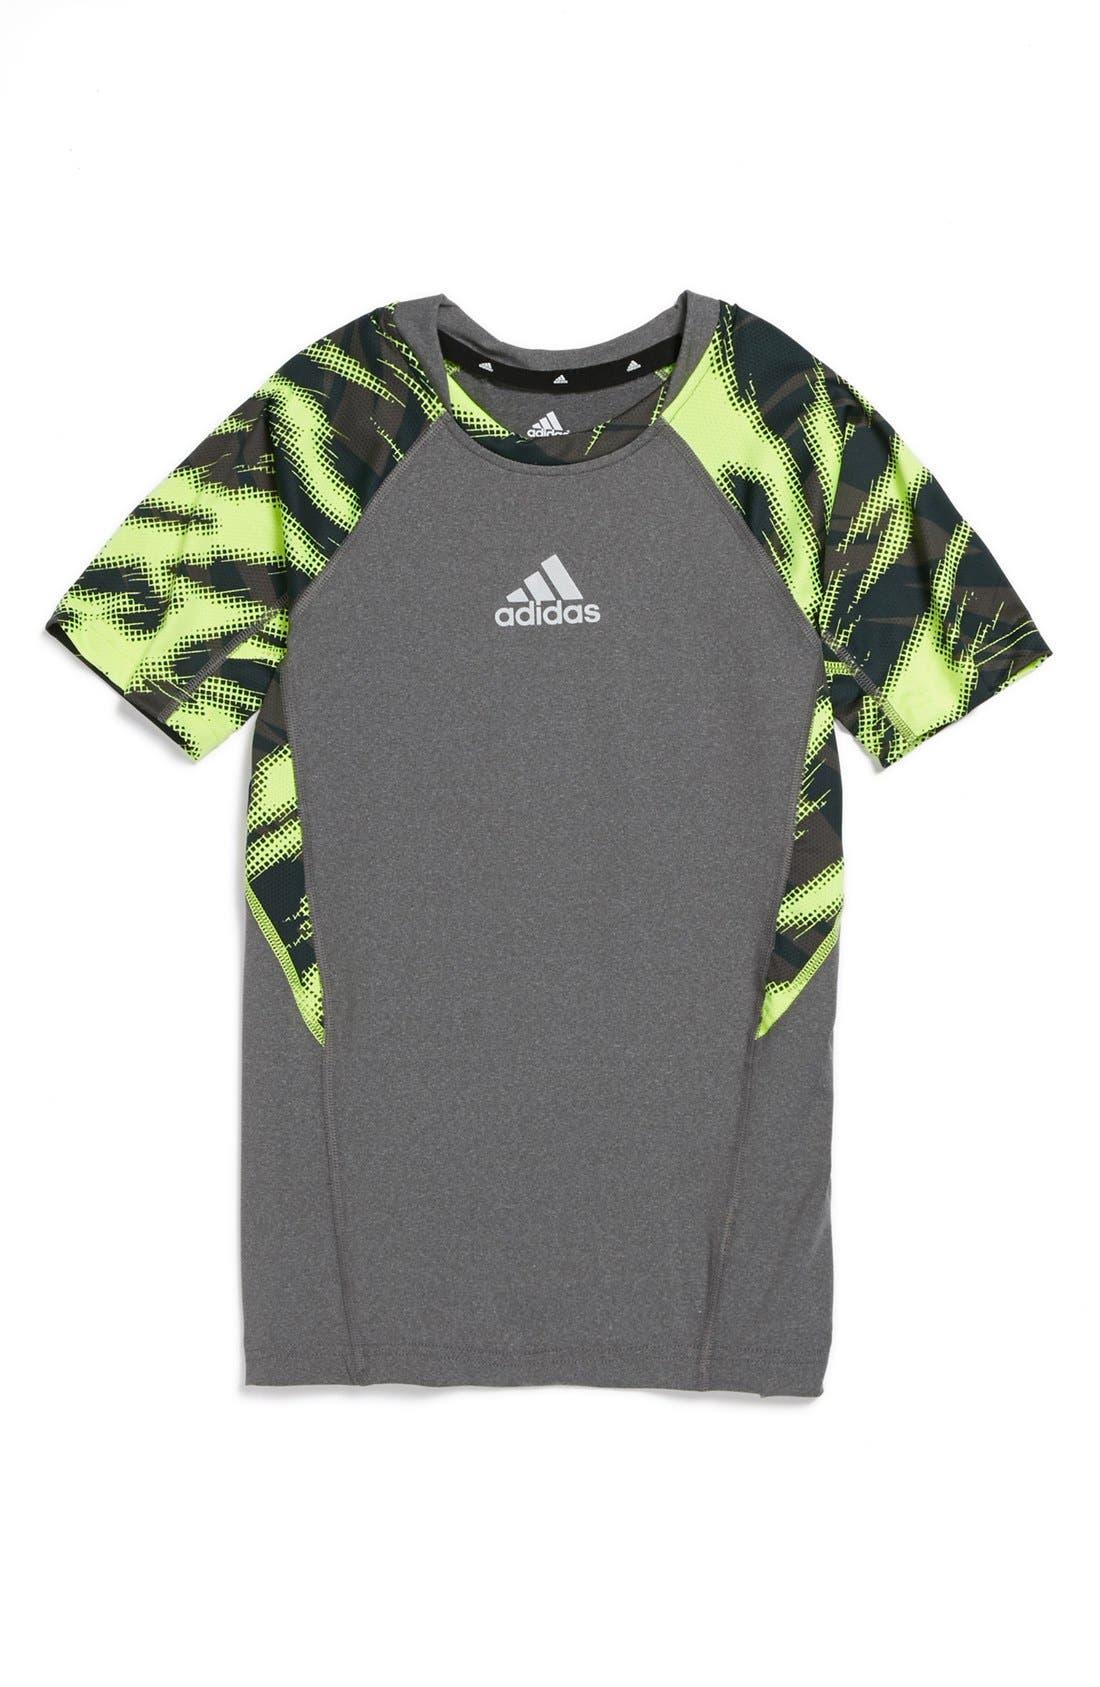 Main Image - adidas Tech Fit Performance T-Shirt (Big Boys)